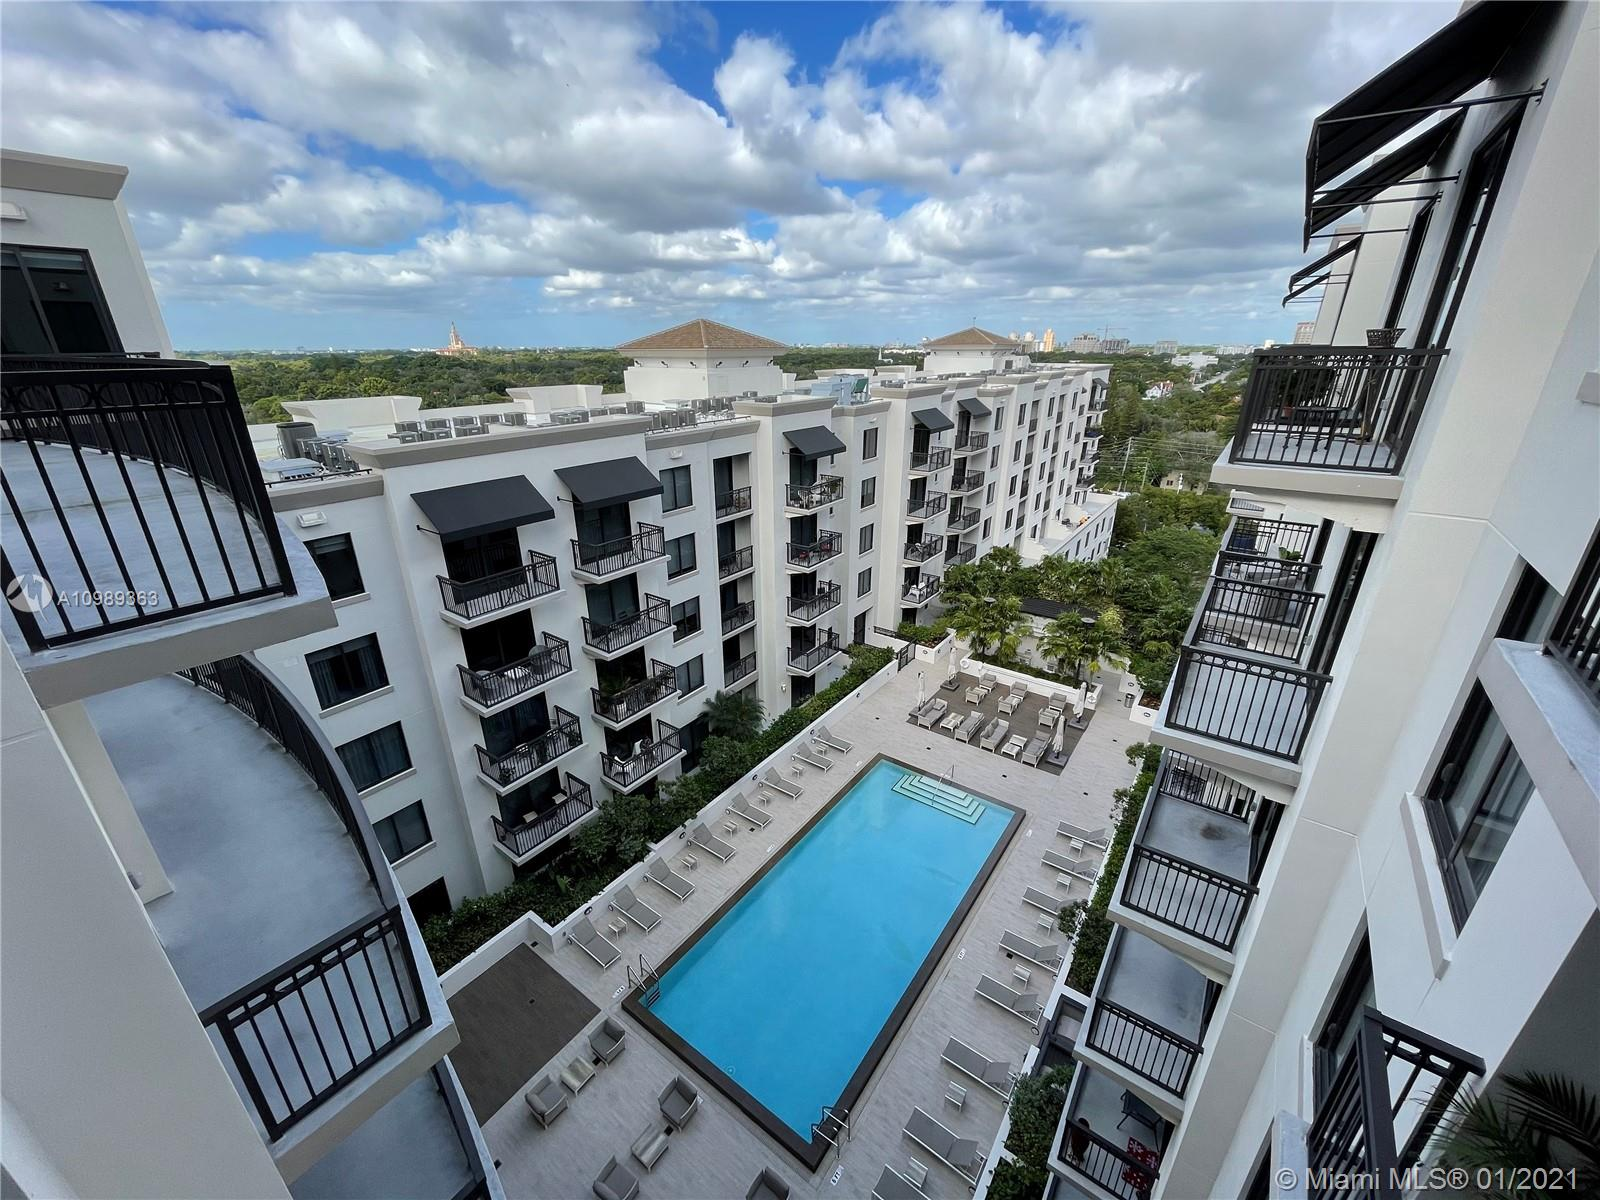 Merrick Manor #UPH1010 - 301 Altara Ave #UPH1010, Coral Gables, FL 33146